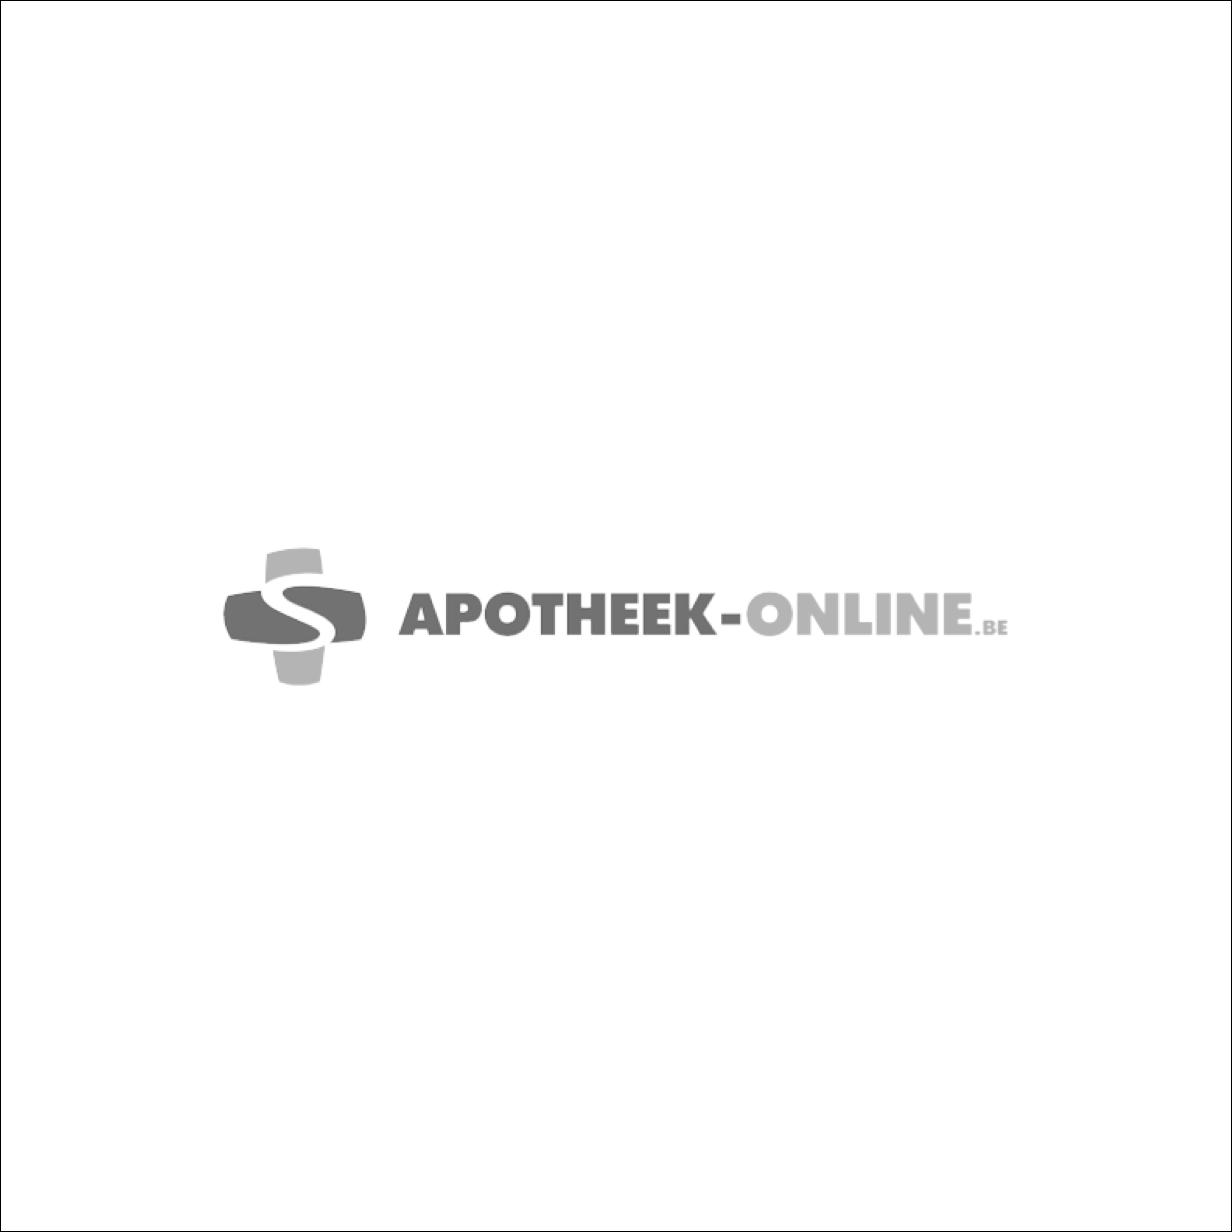 MEDIPORE 3M VERB ELAST ADH ROL 10CMX10M 2991/2